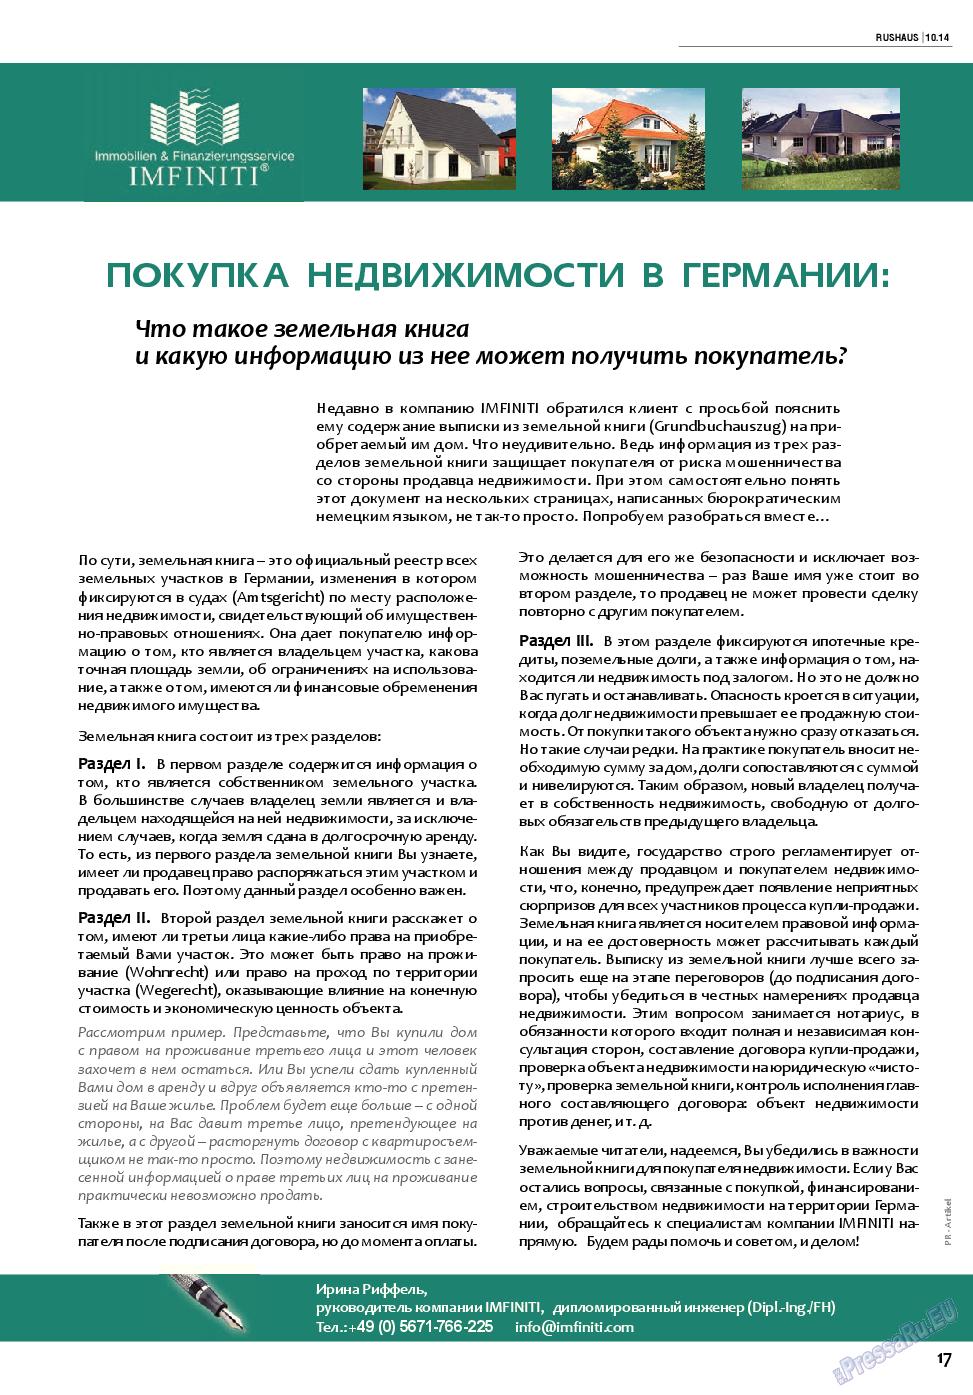 RusHaus (журнал). 2014 год, номер 2, стр. 17